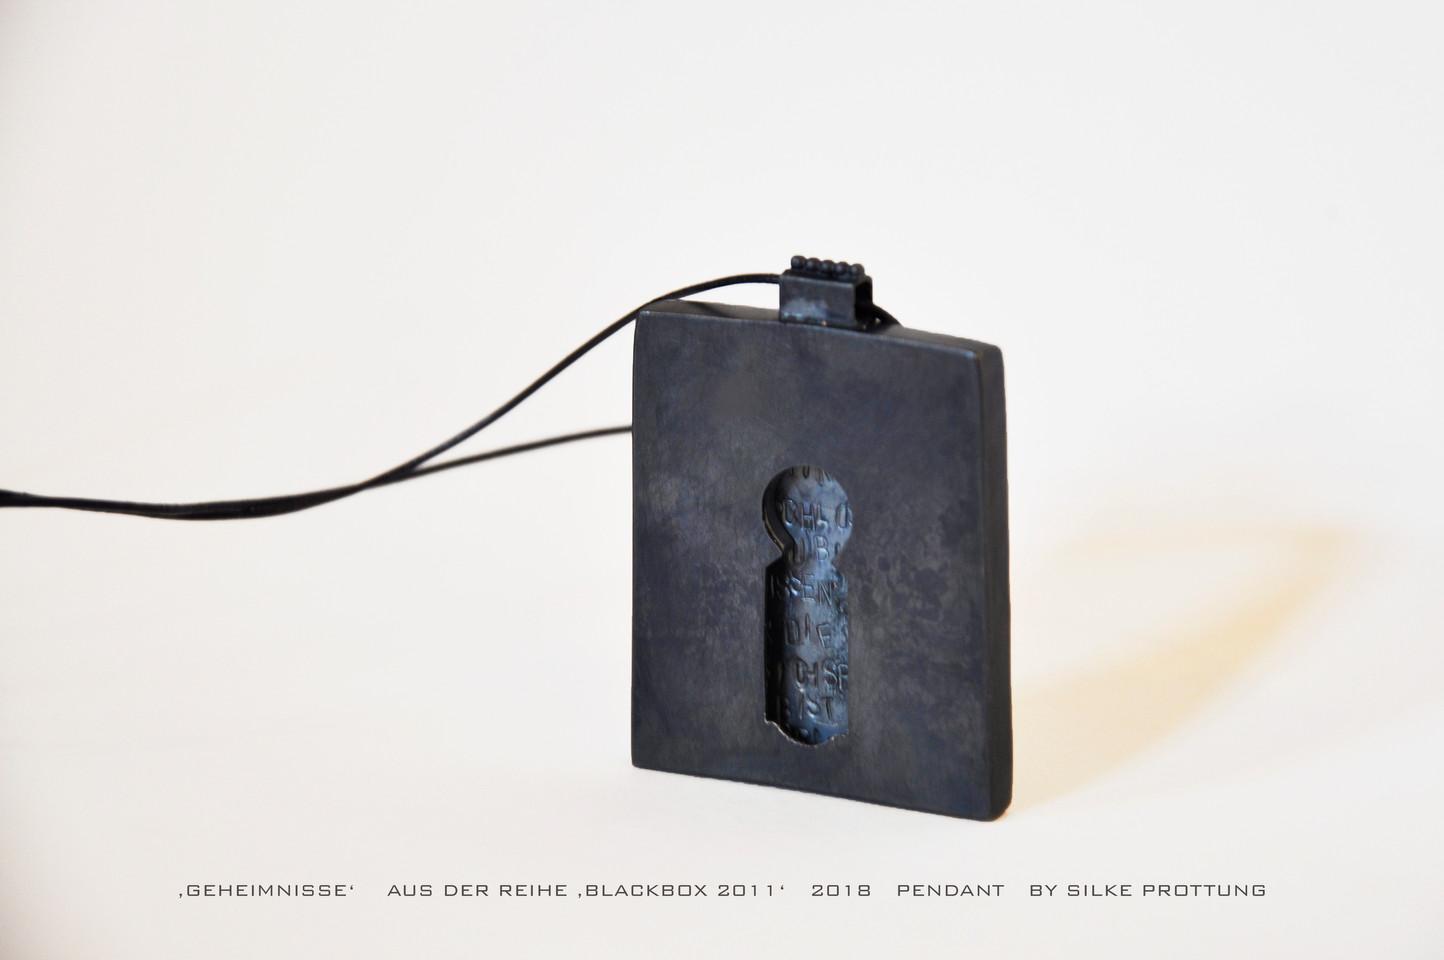 Blackbox-Geheimnisse